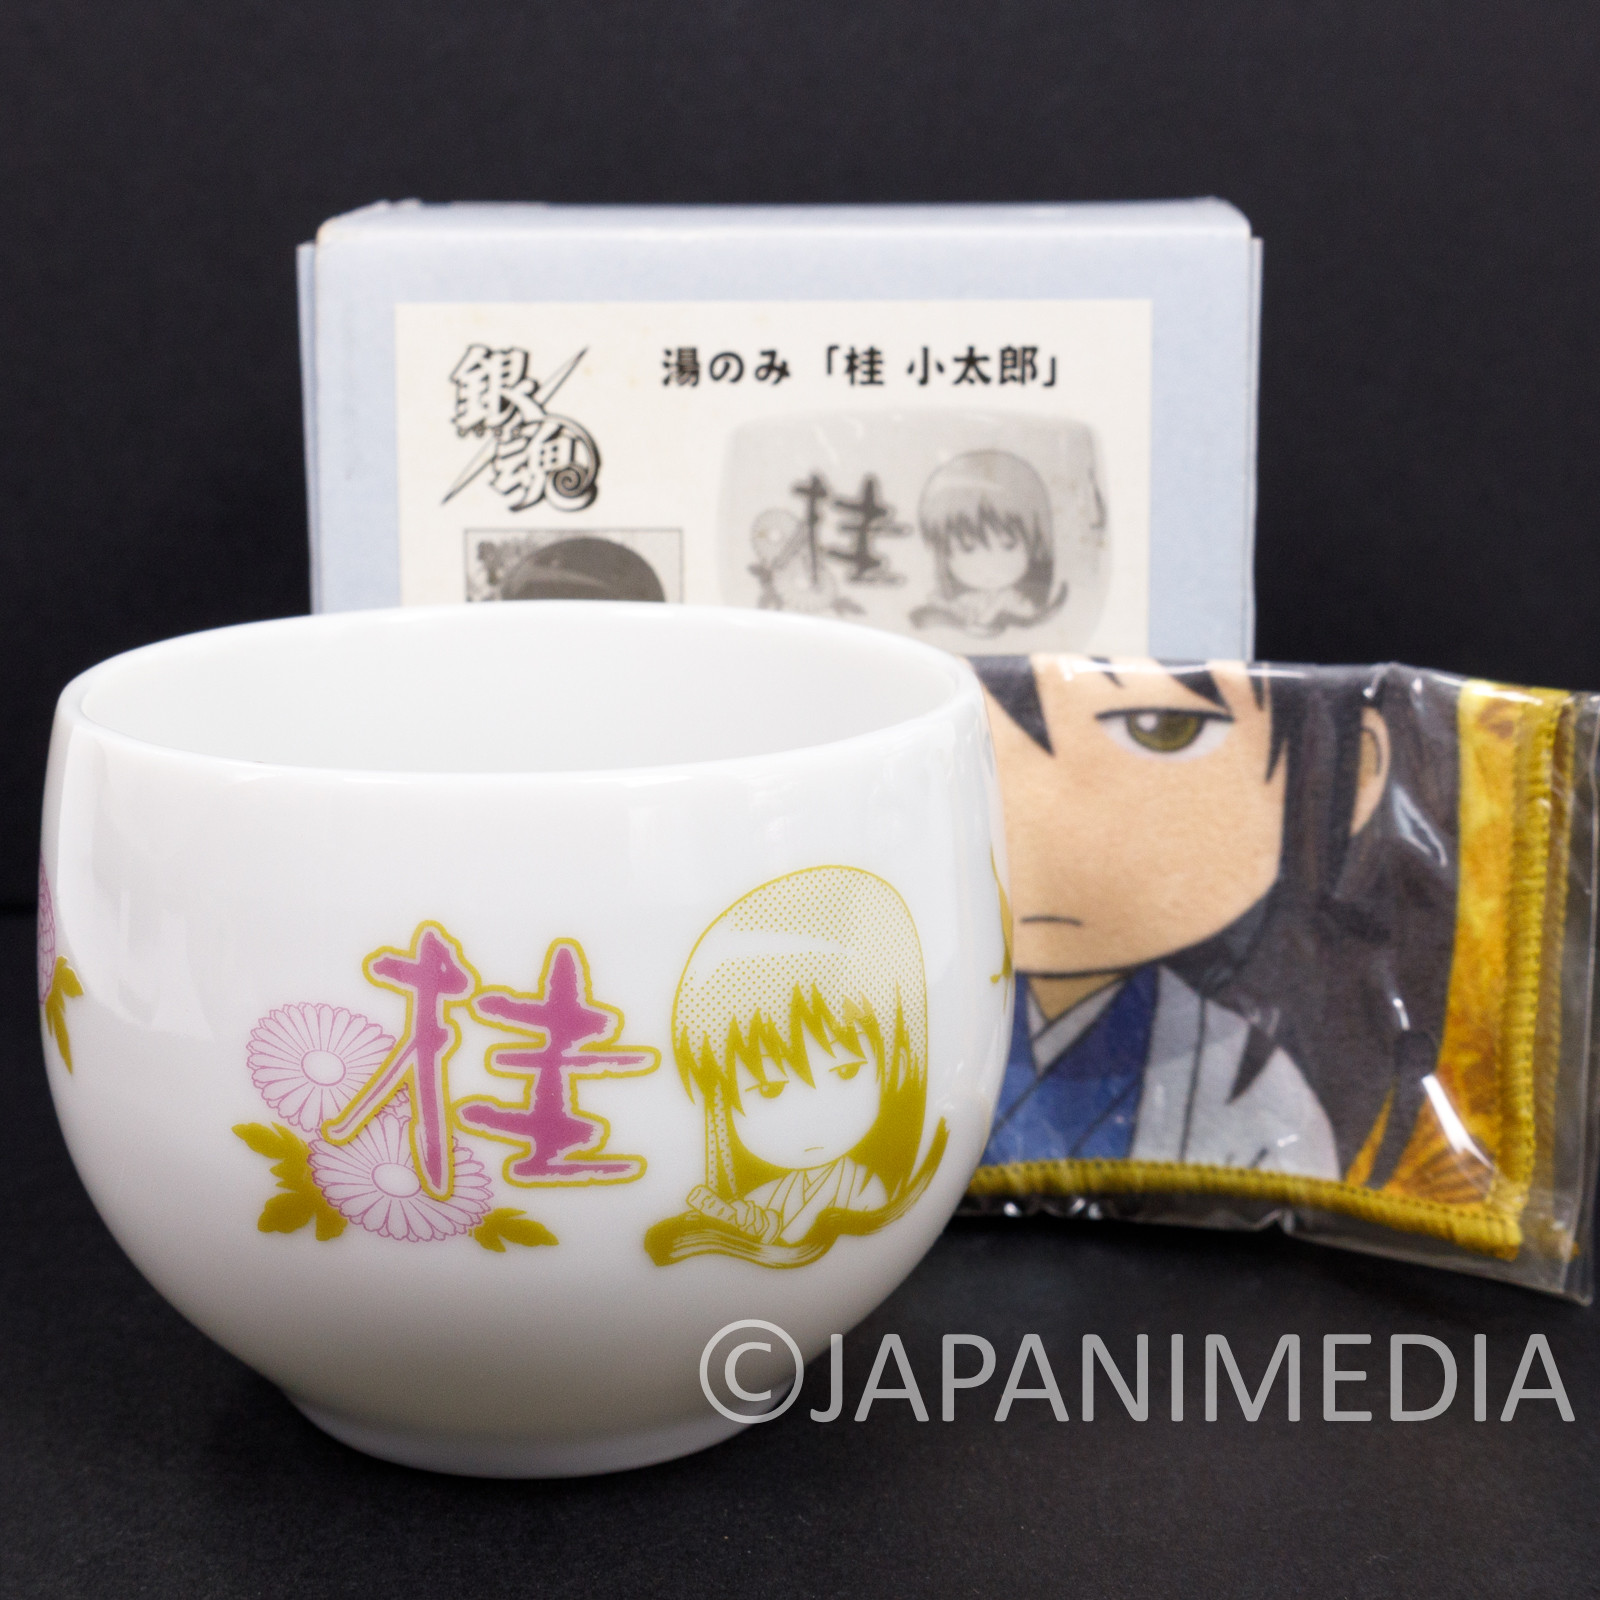 Gintama Kotaro Katsura Yunomi Japanease Tea Cup w/ Microfiber Cloth